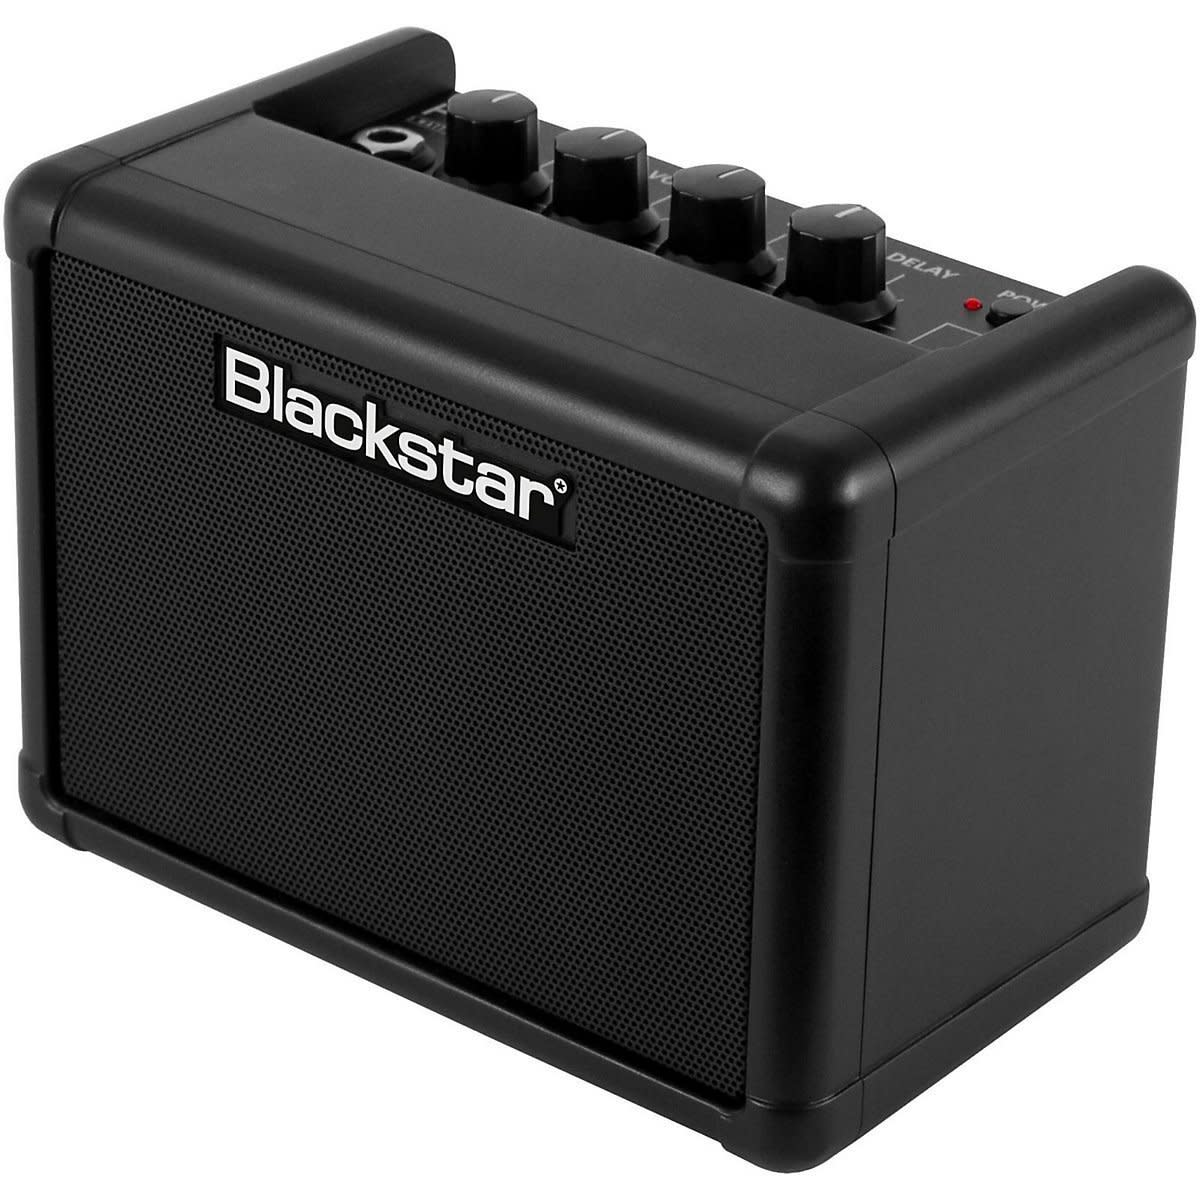 Mini Amps Review : blackstar fly 3 mini amp review spinditty ~ Vivirlamusica.com Haus und Dekorationen